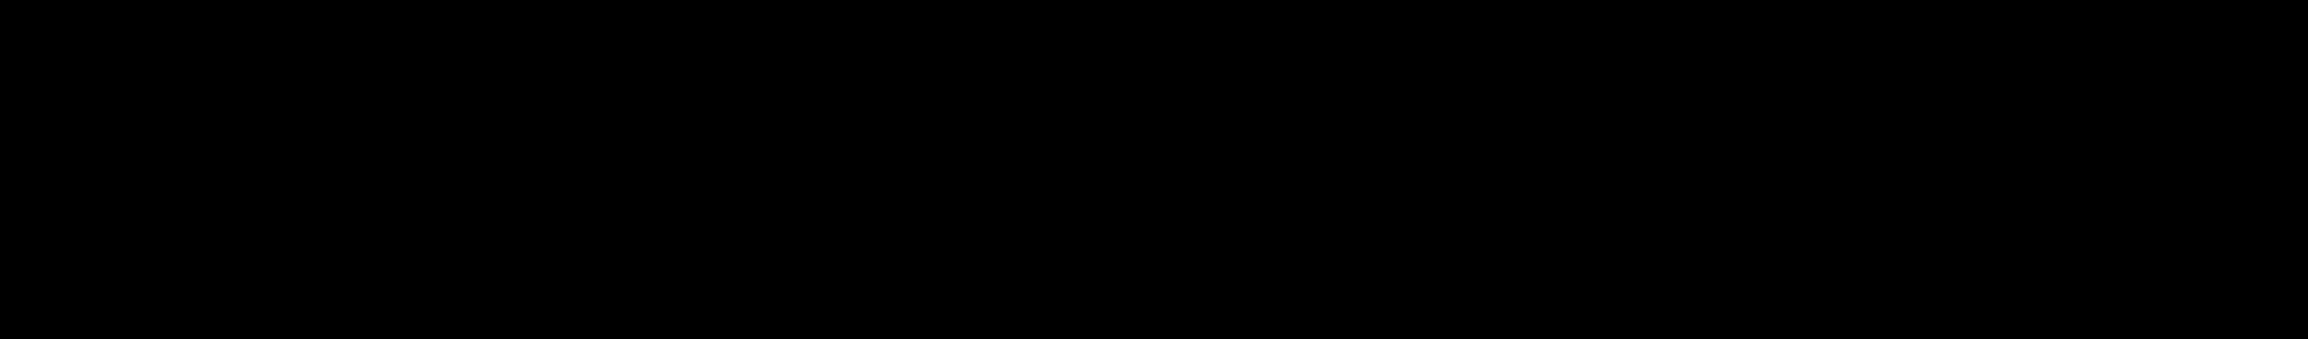 IFTT Icon